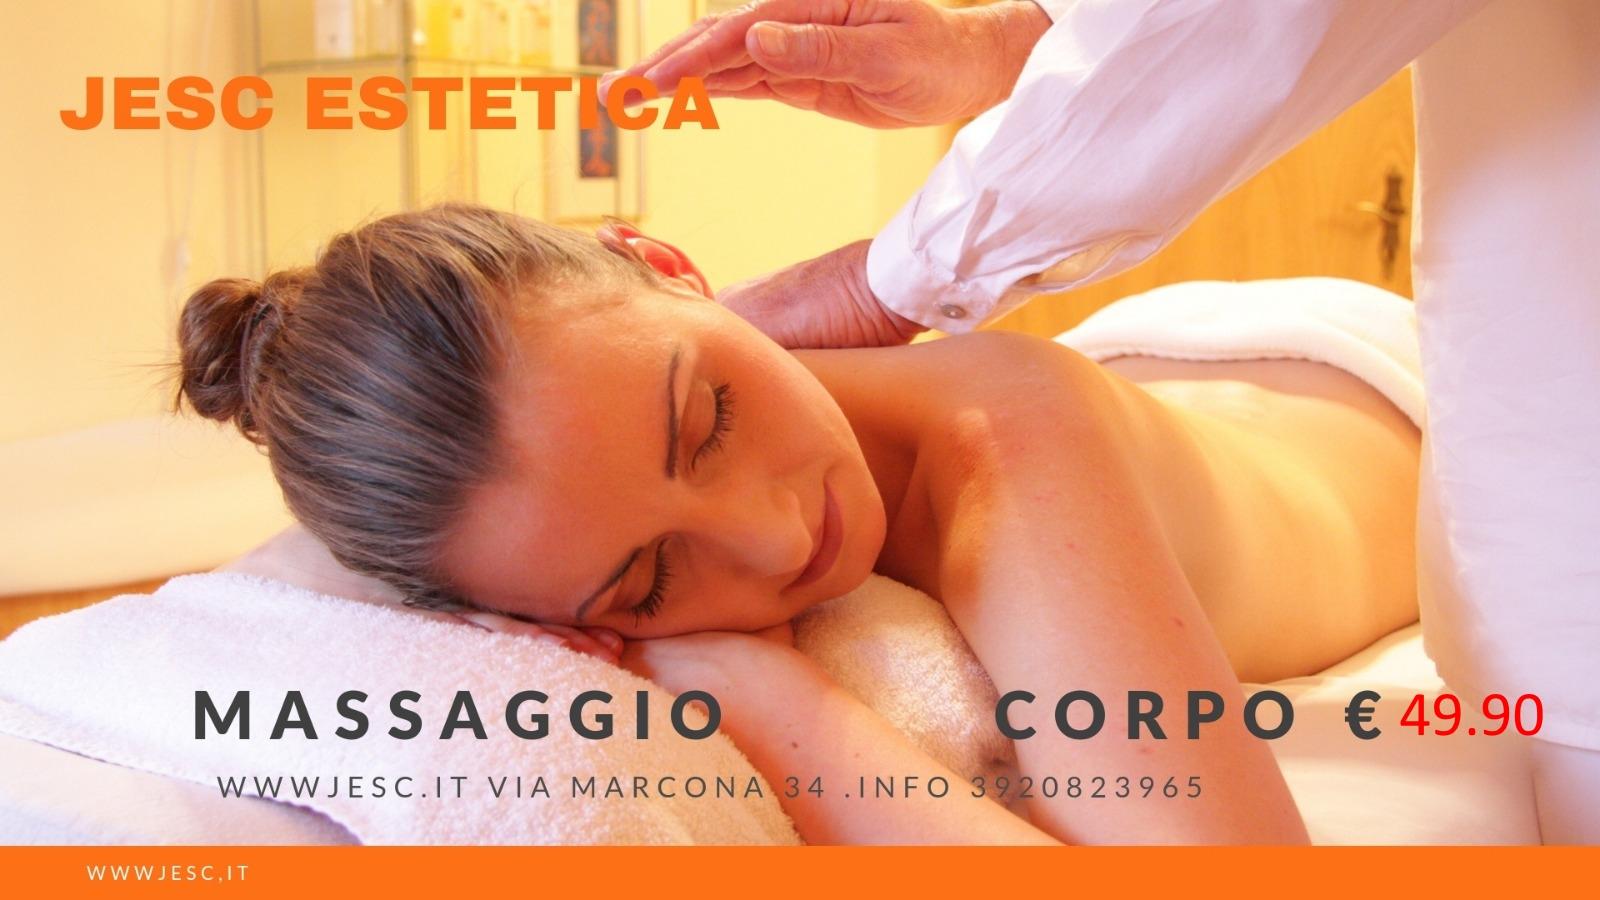 gay massage milan massaggi donne milano